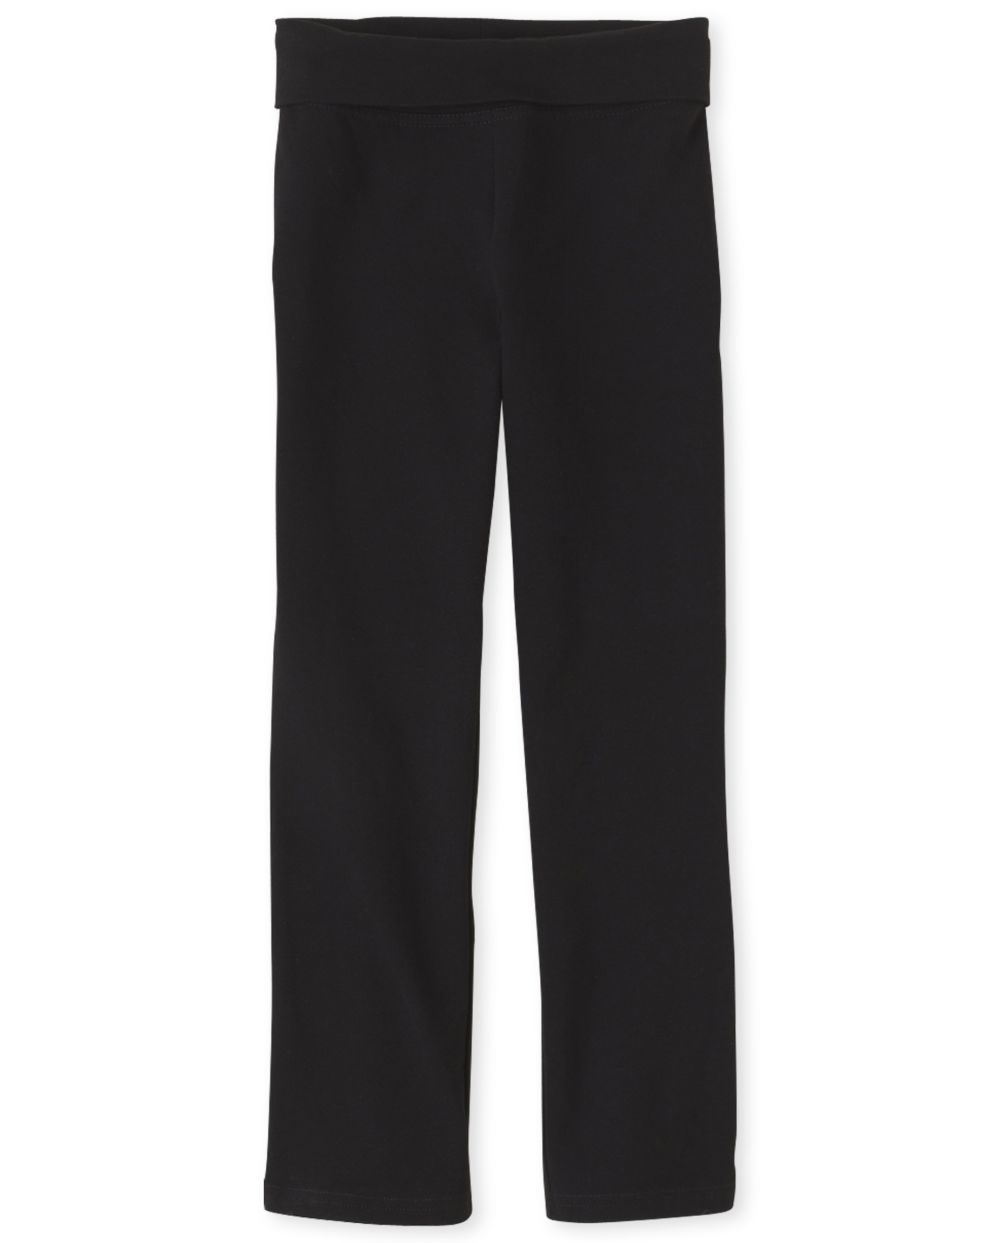 Compare Girls Uniform Active Foldover Waist Pants